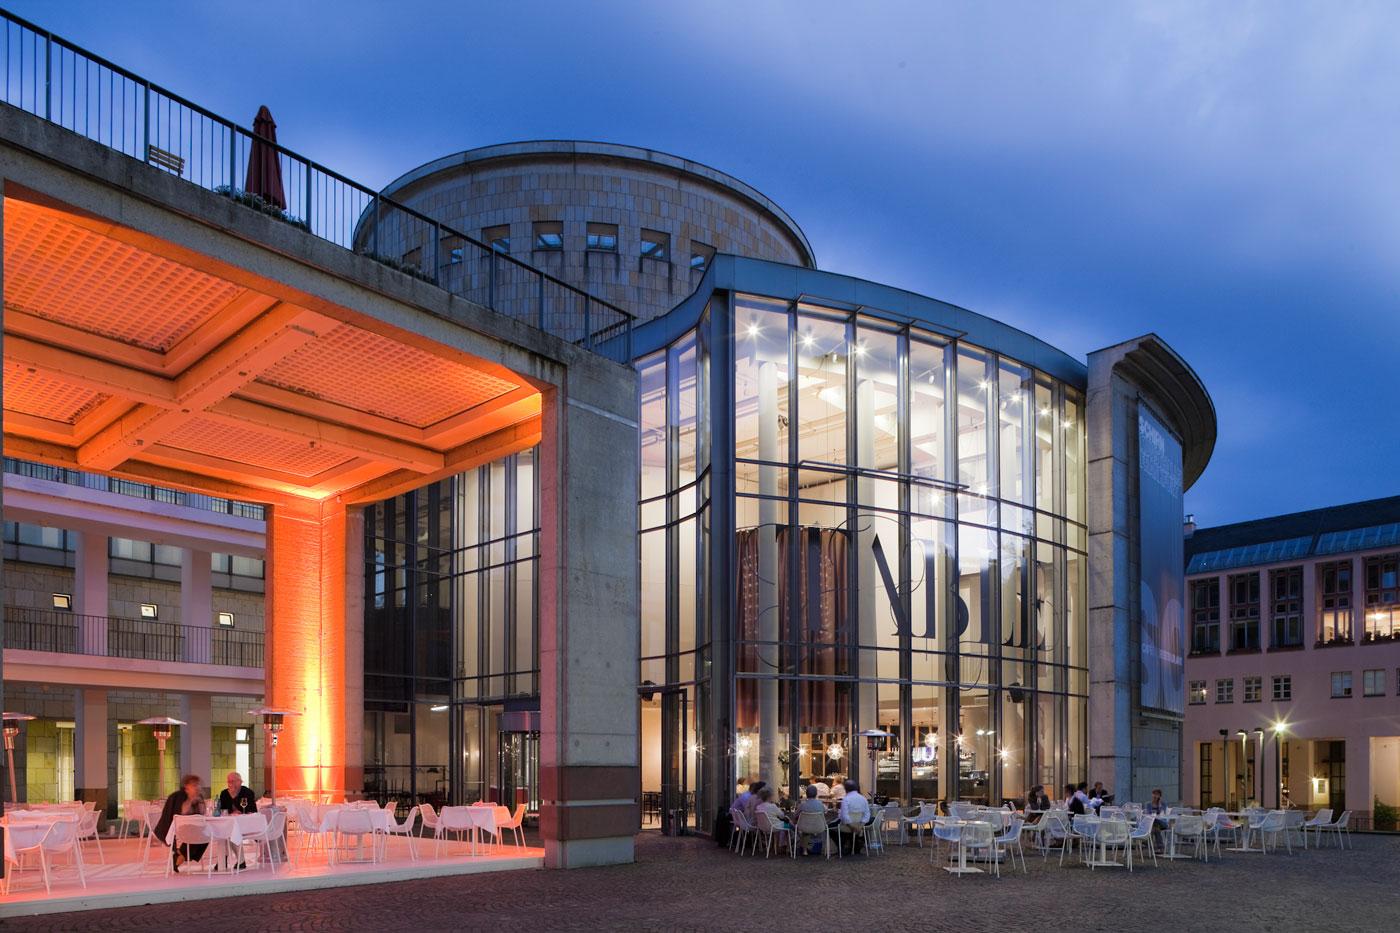 frankfurt-am-main-schirn-kunsthalle-frankfurt5